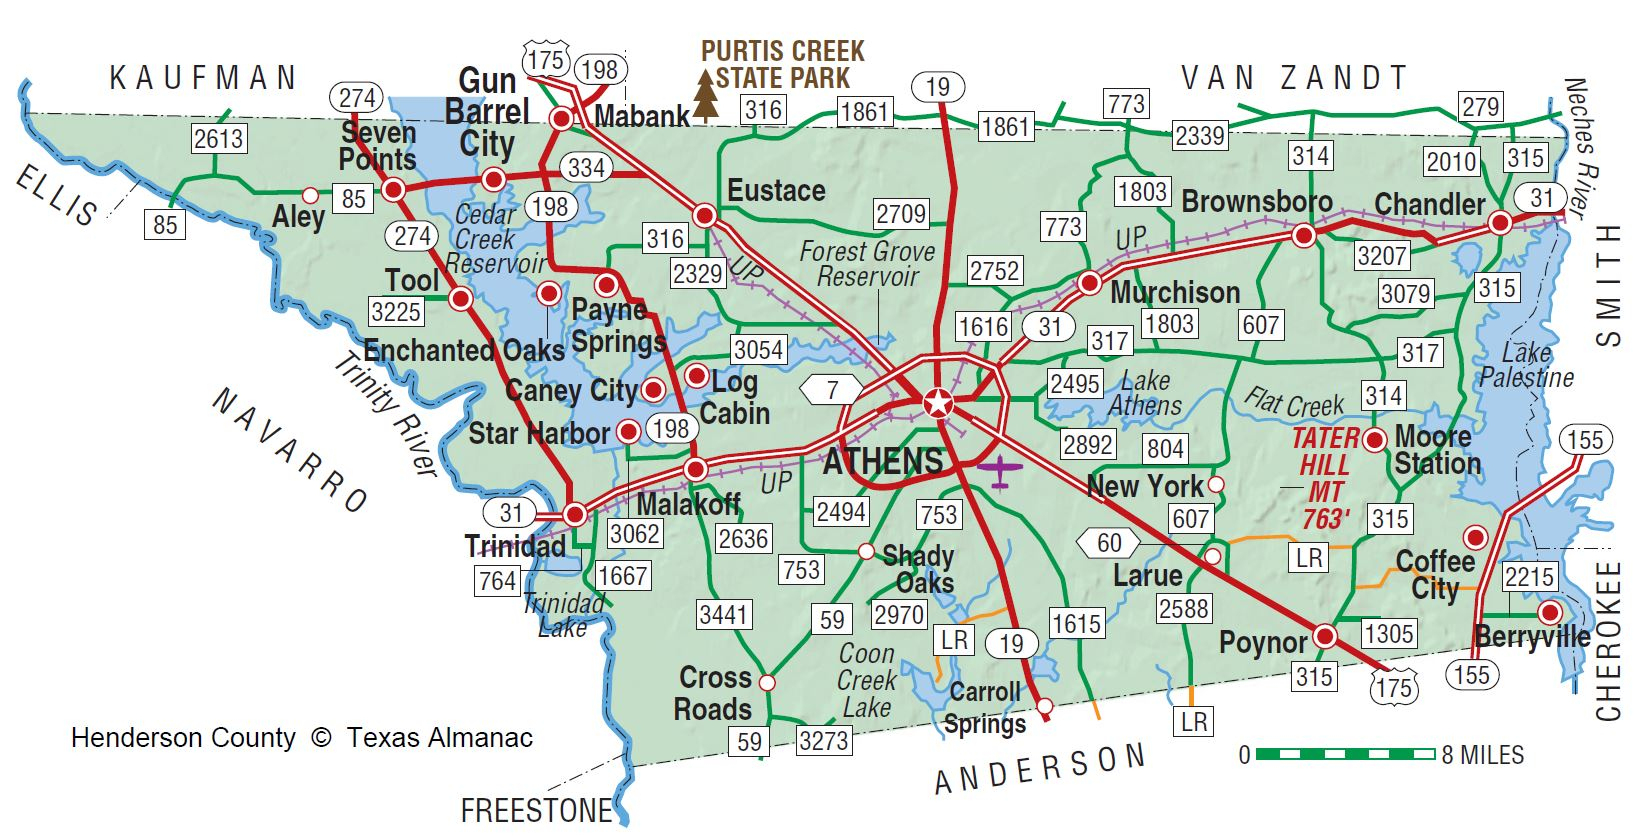 Henderson County | The Handbook Of Texas Online| Texas State - Van Zandt County Texas Map